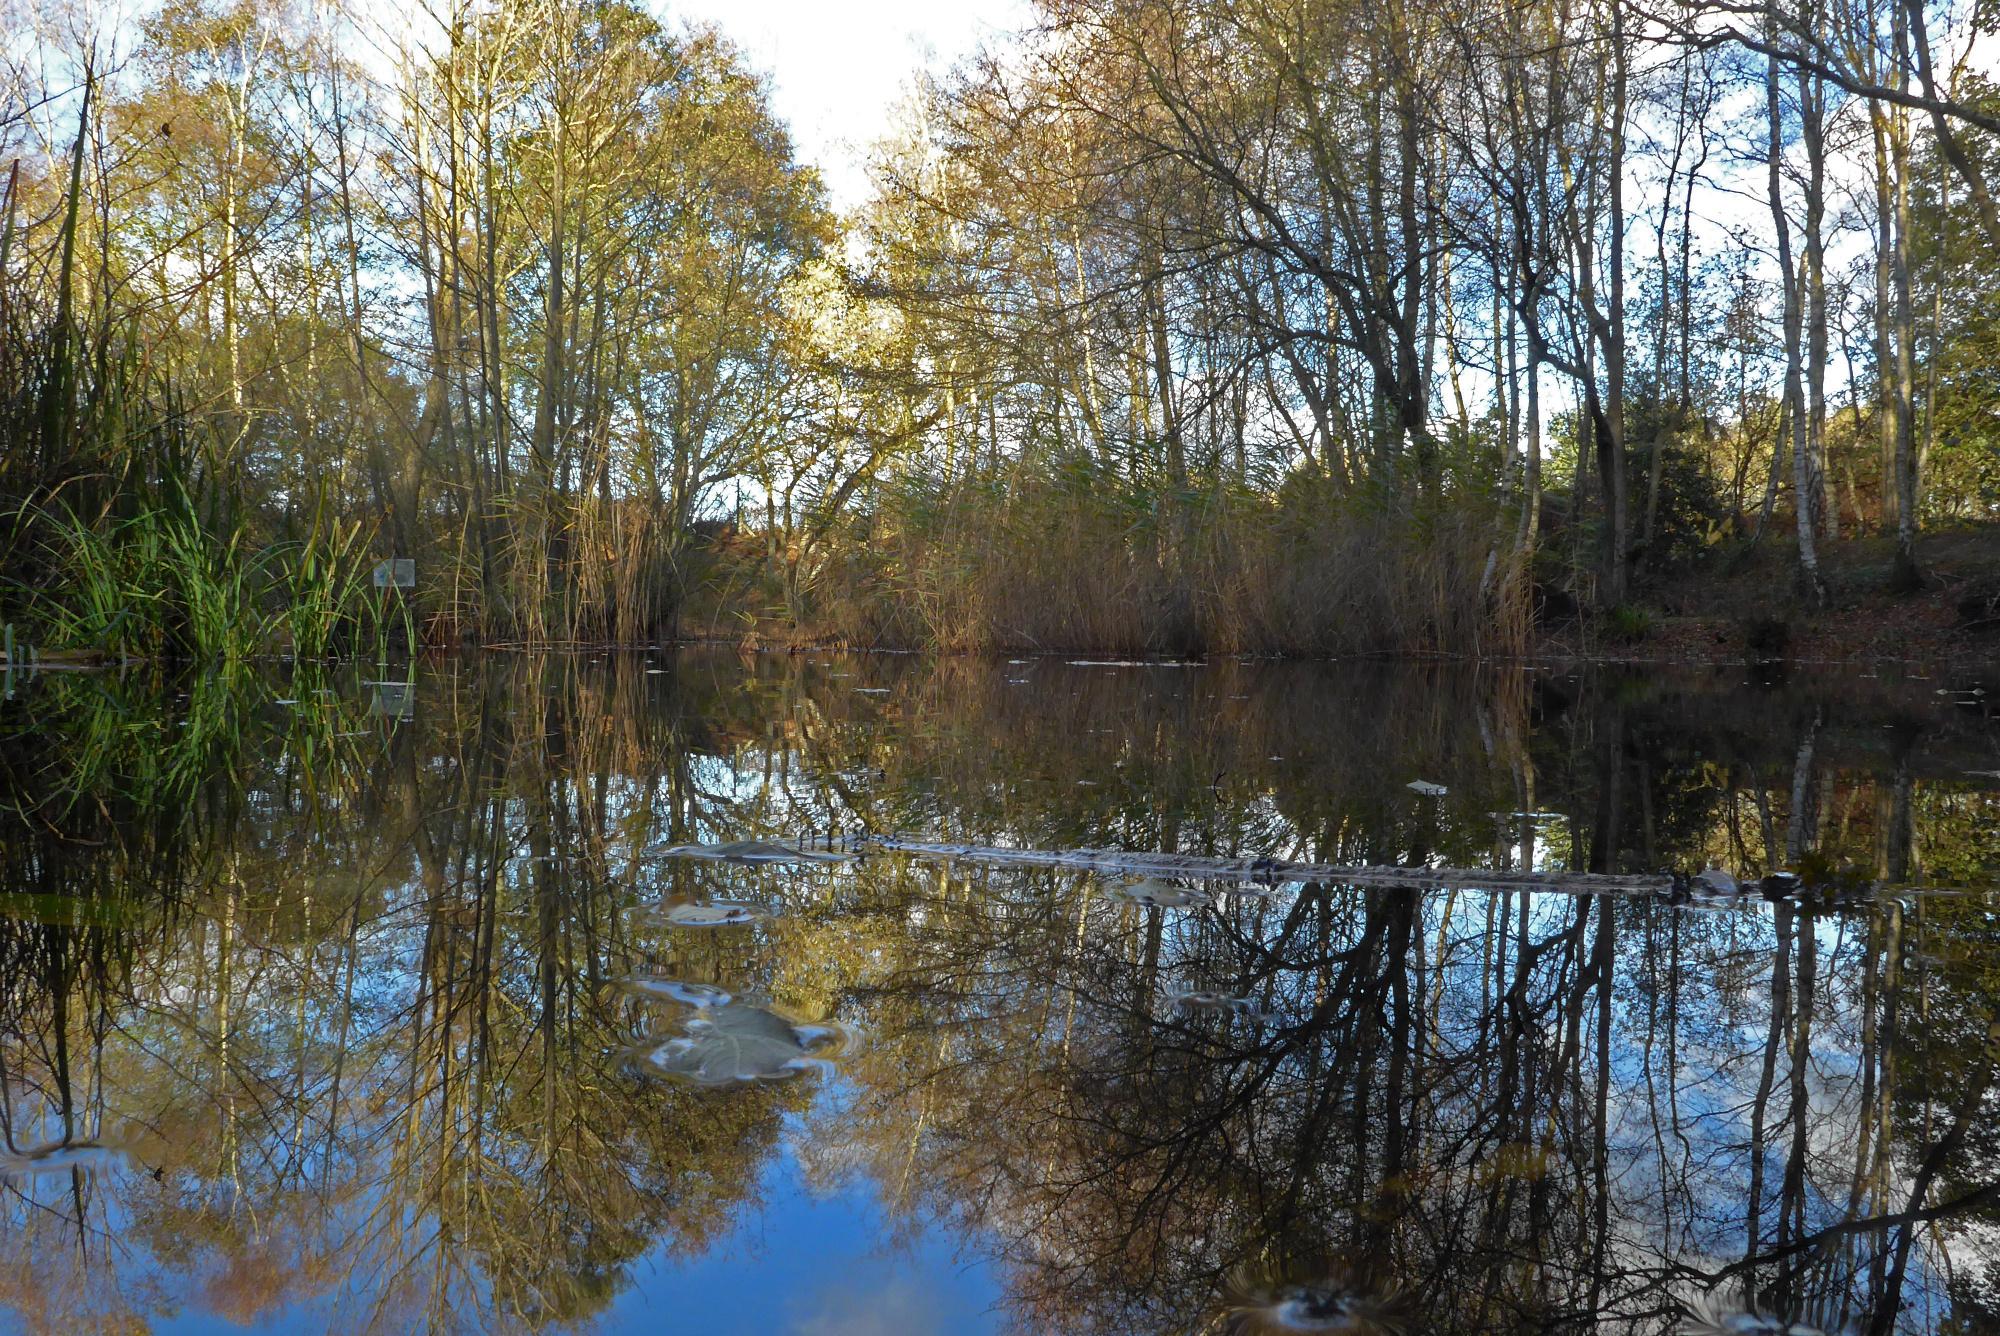 Fisherman's Pond